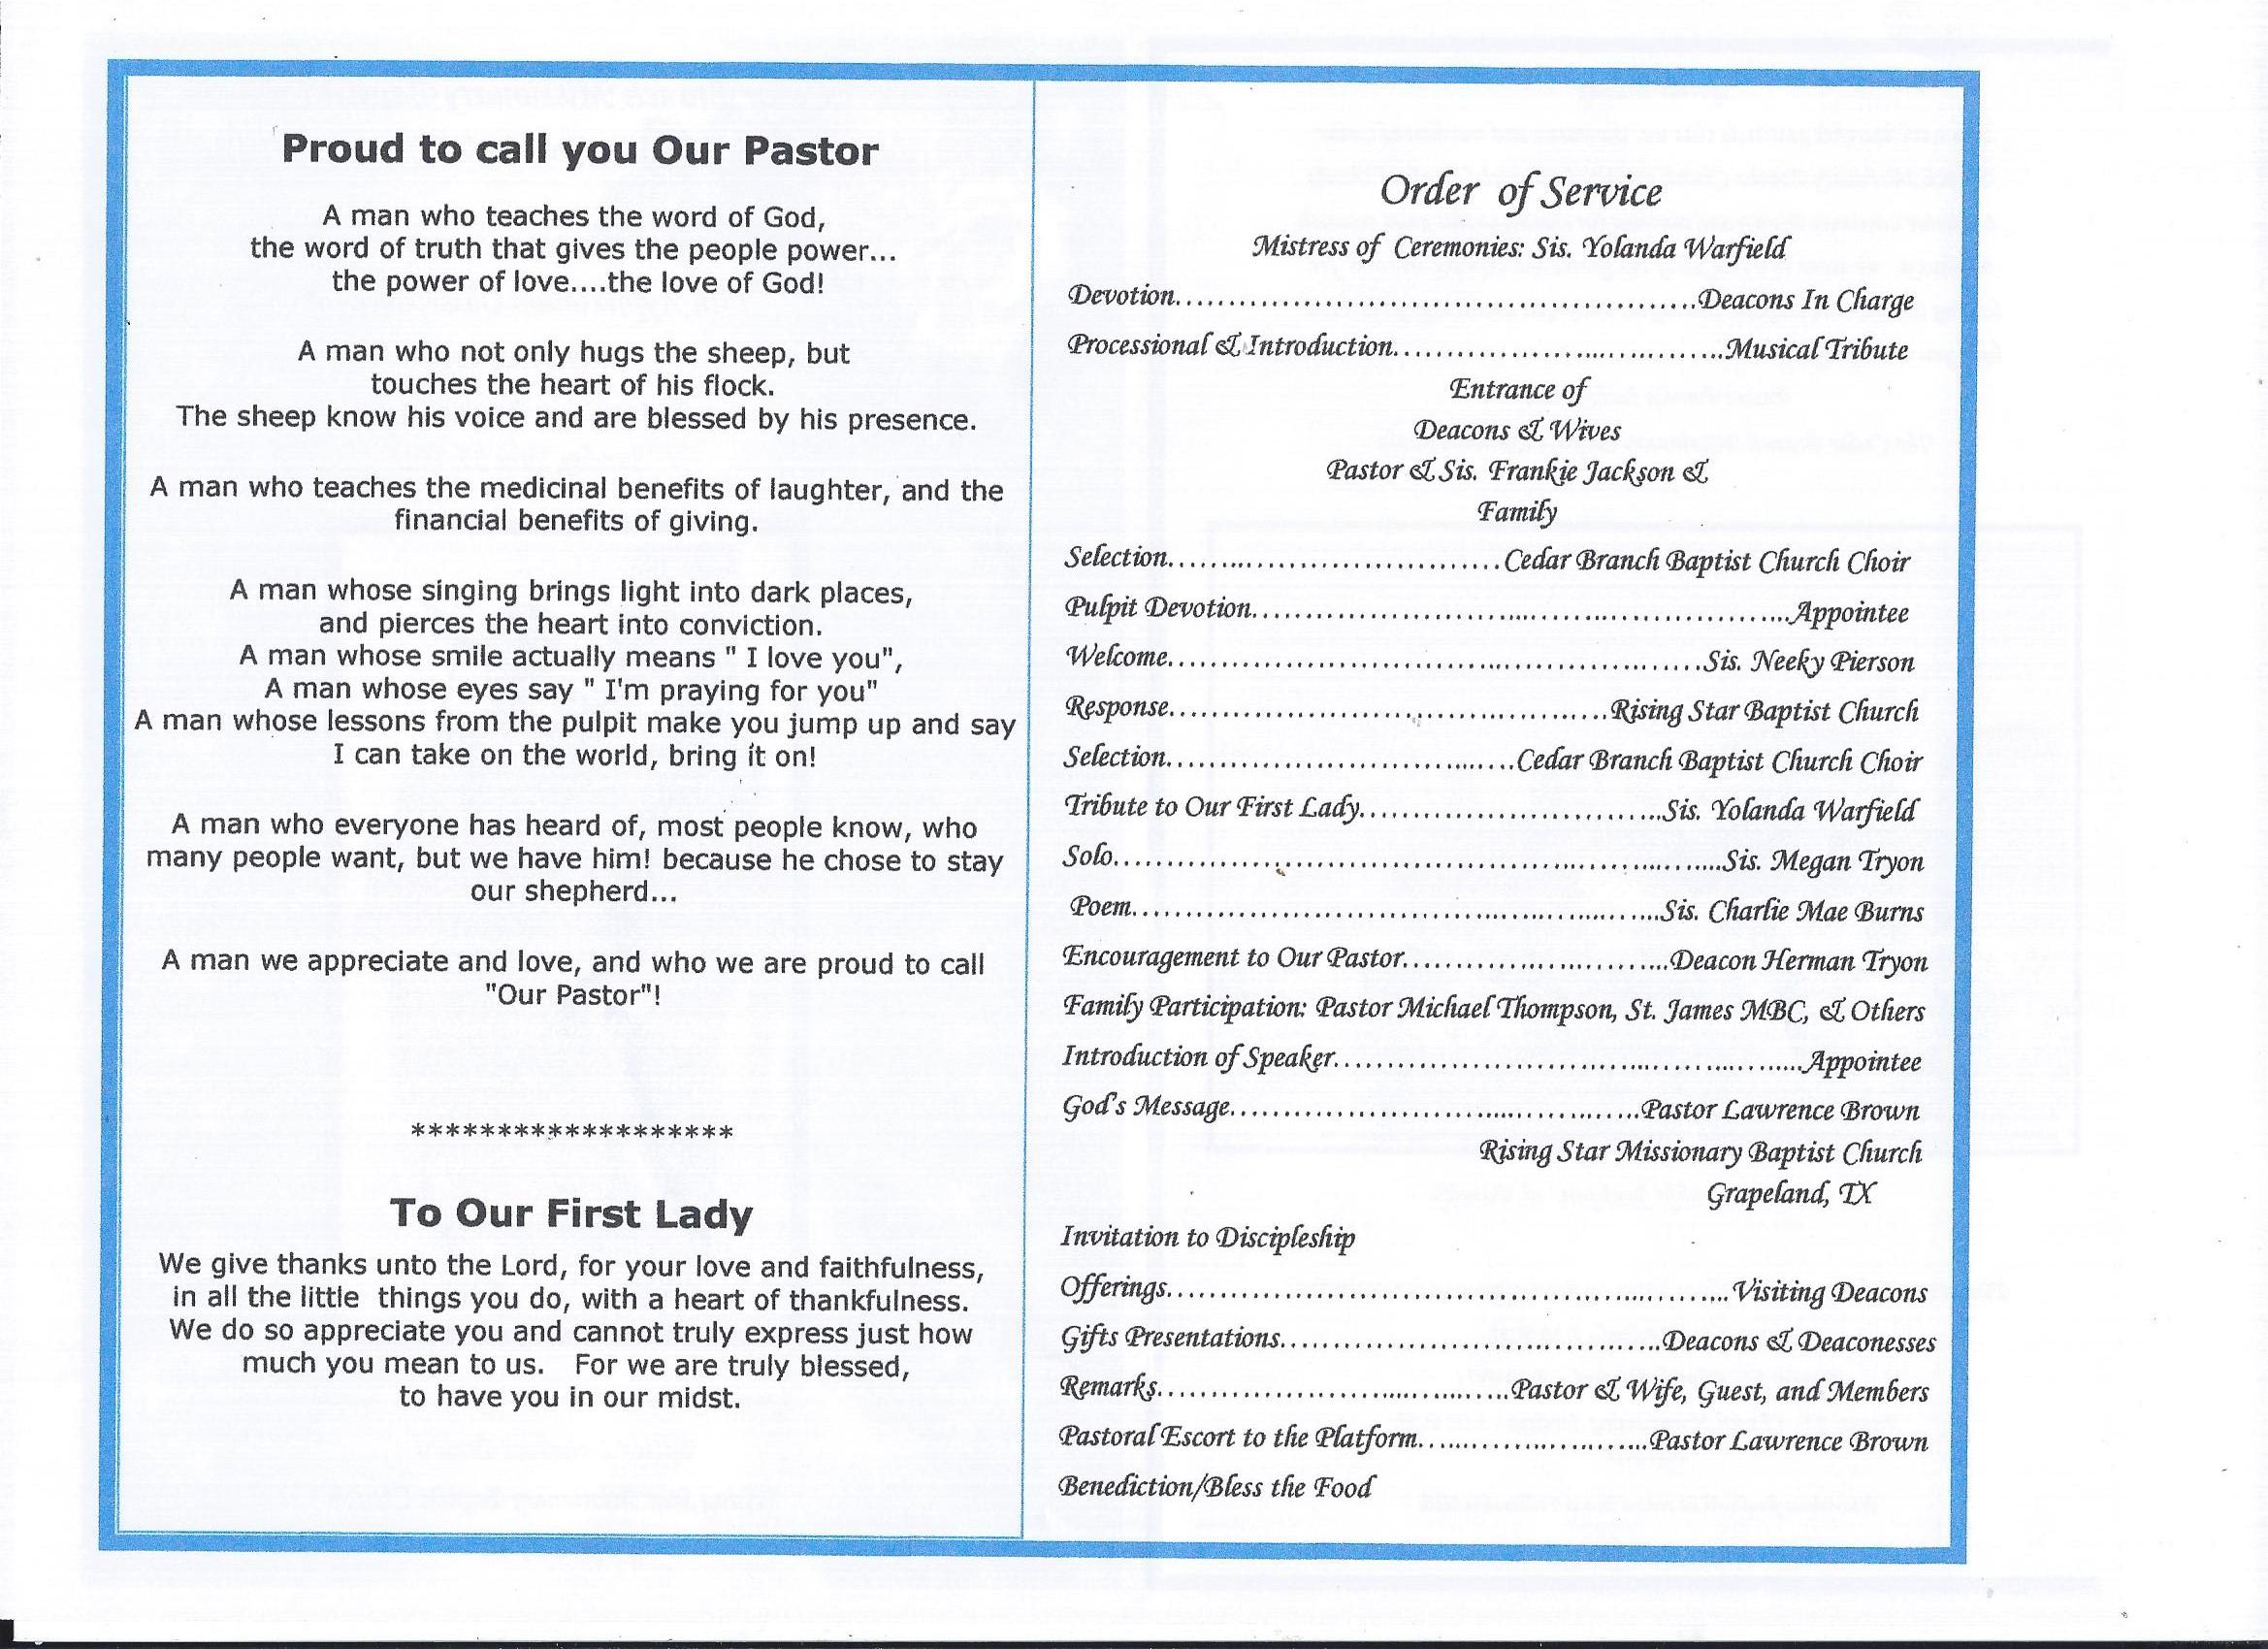 Pastor & Wife's 15  Anniversary 6-25-2017